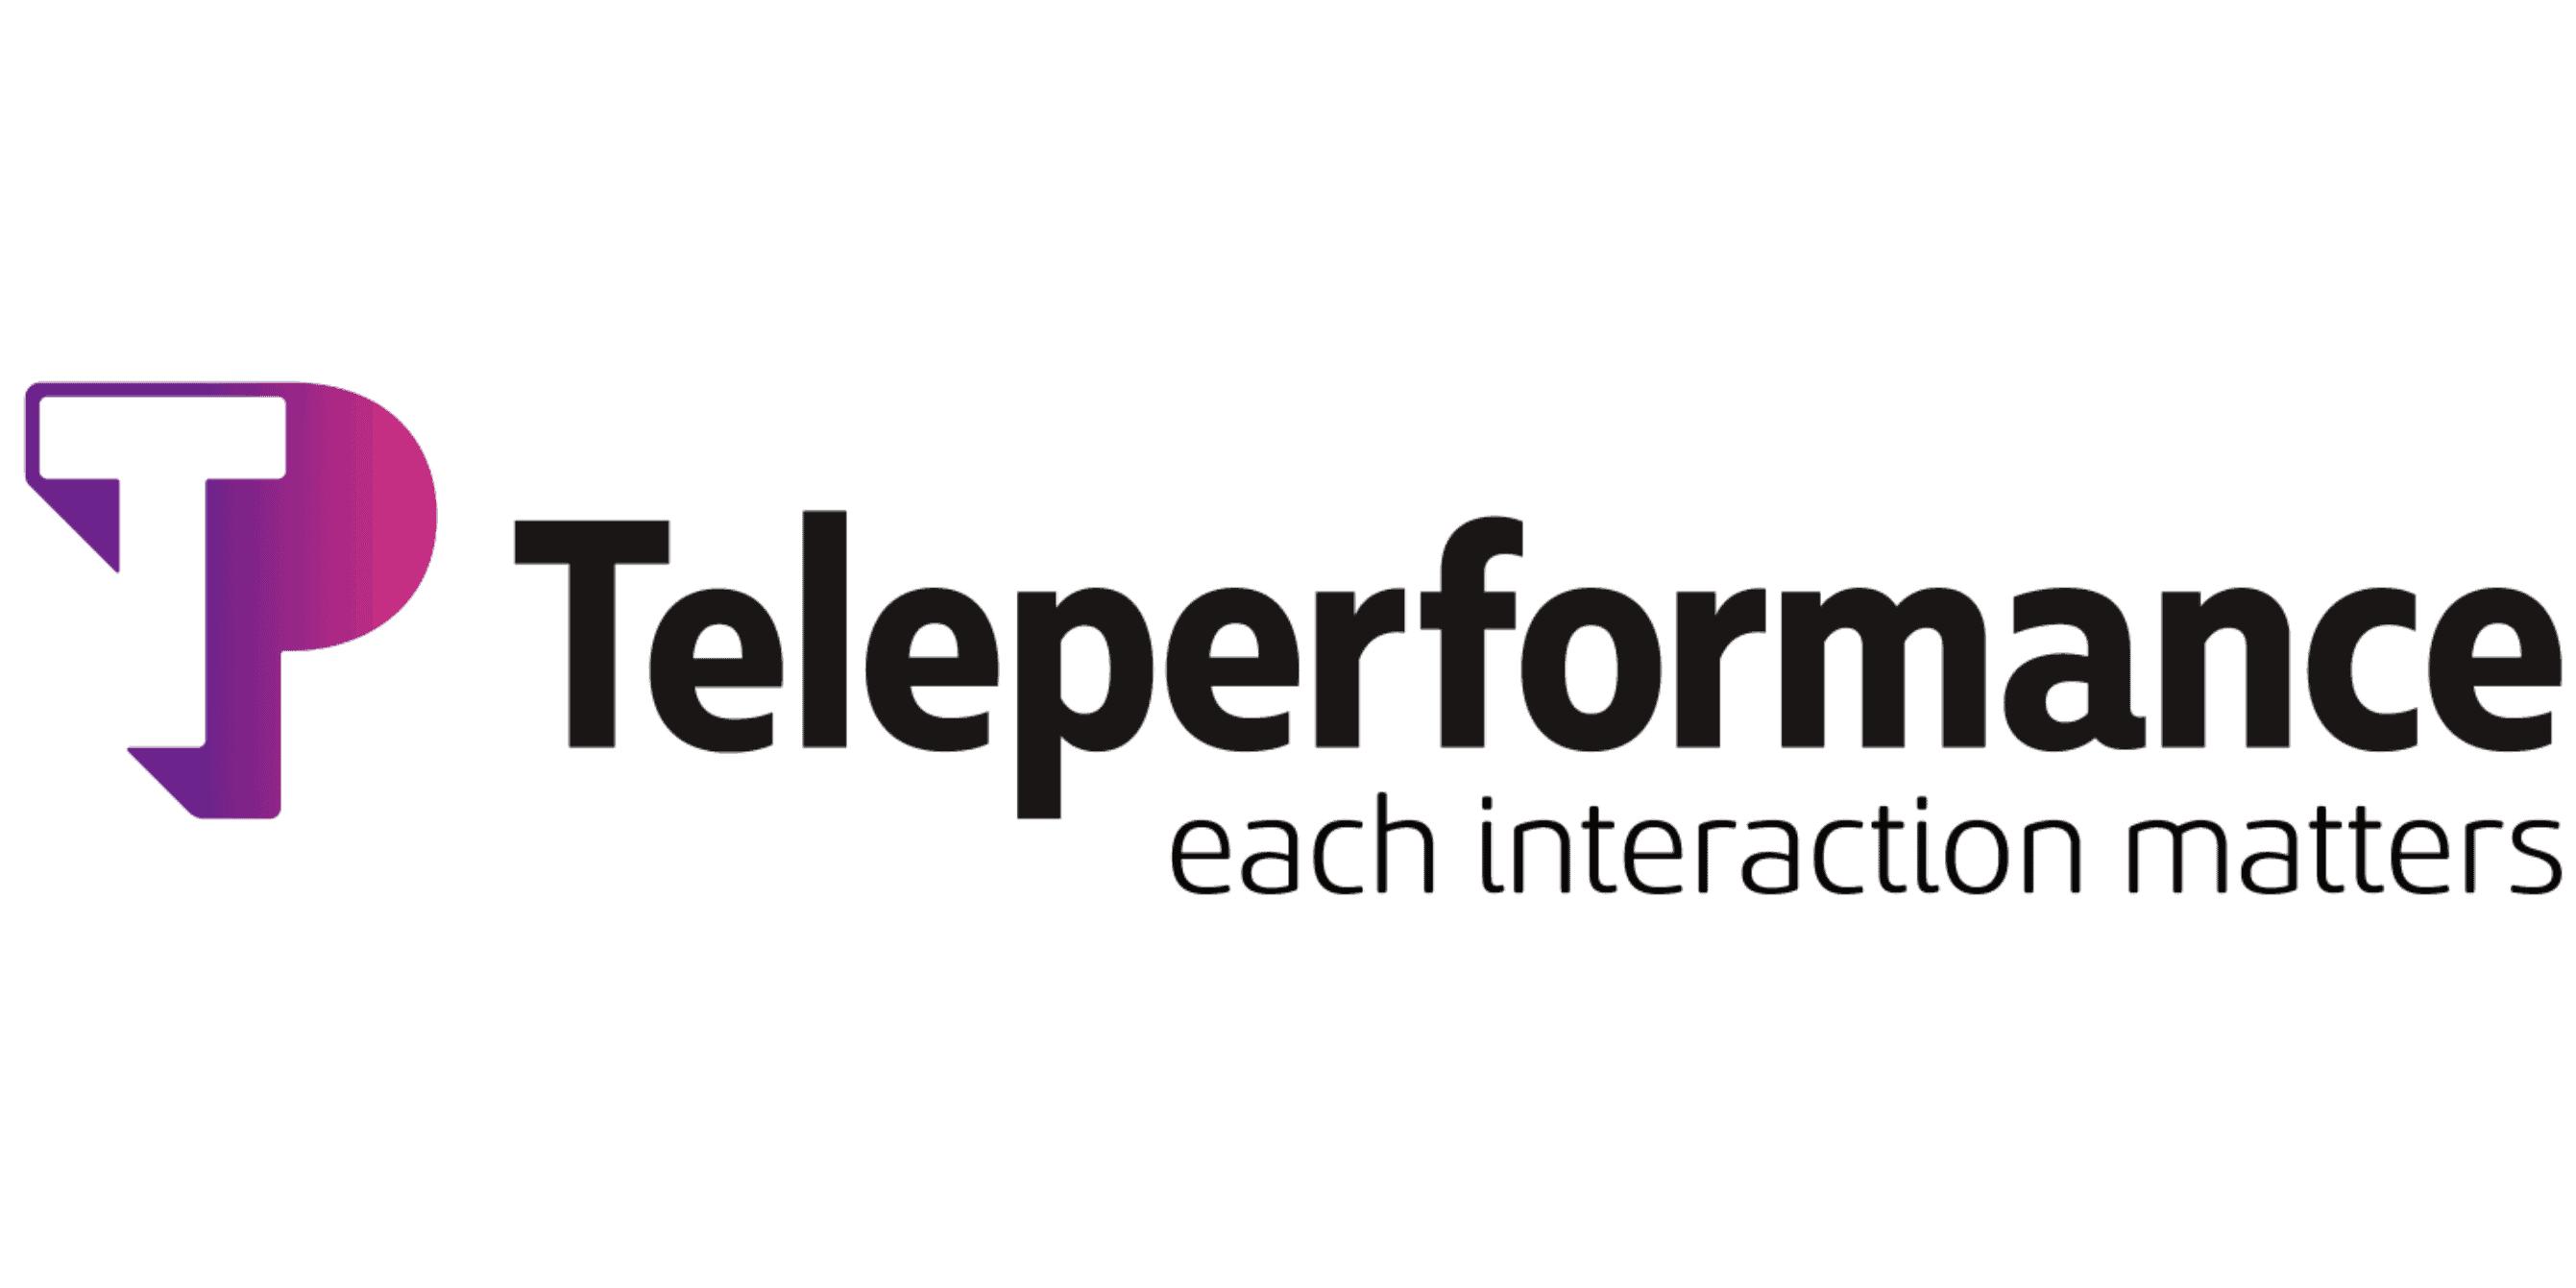 talentportugal-teleperformance logo